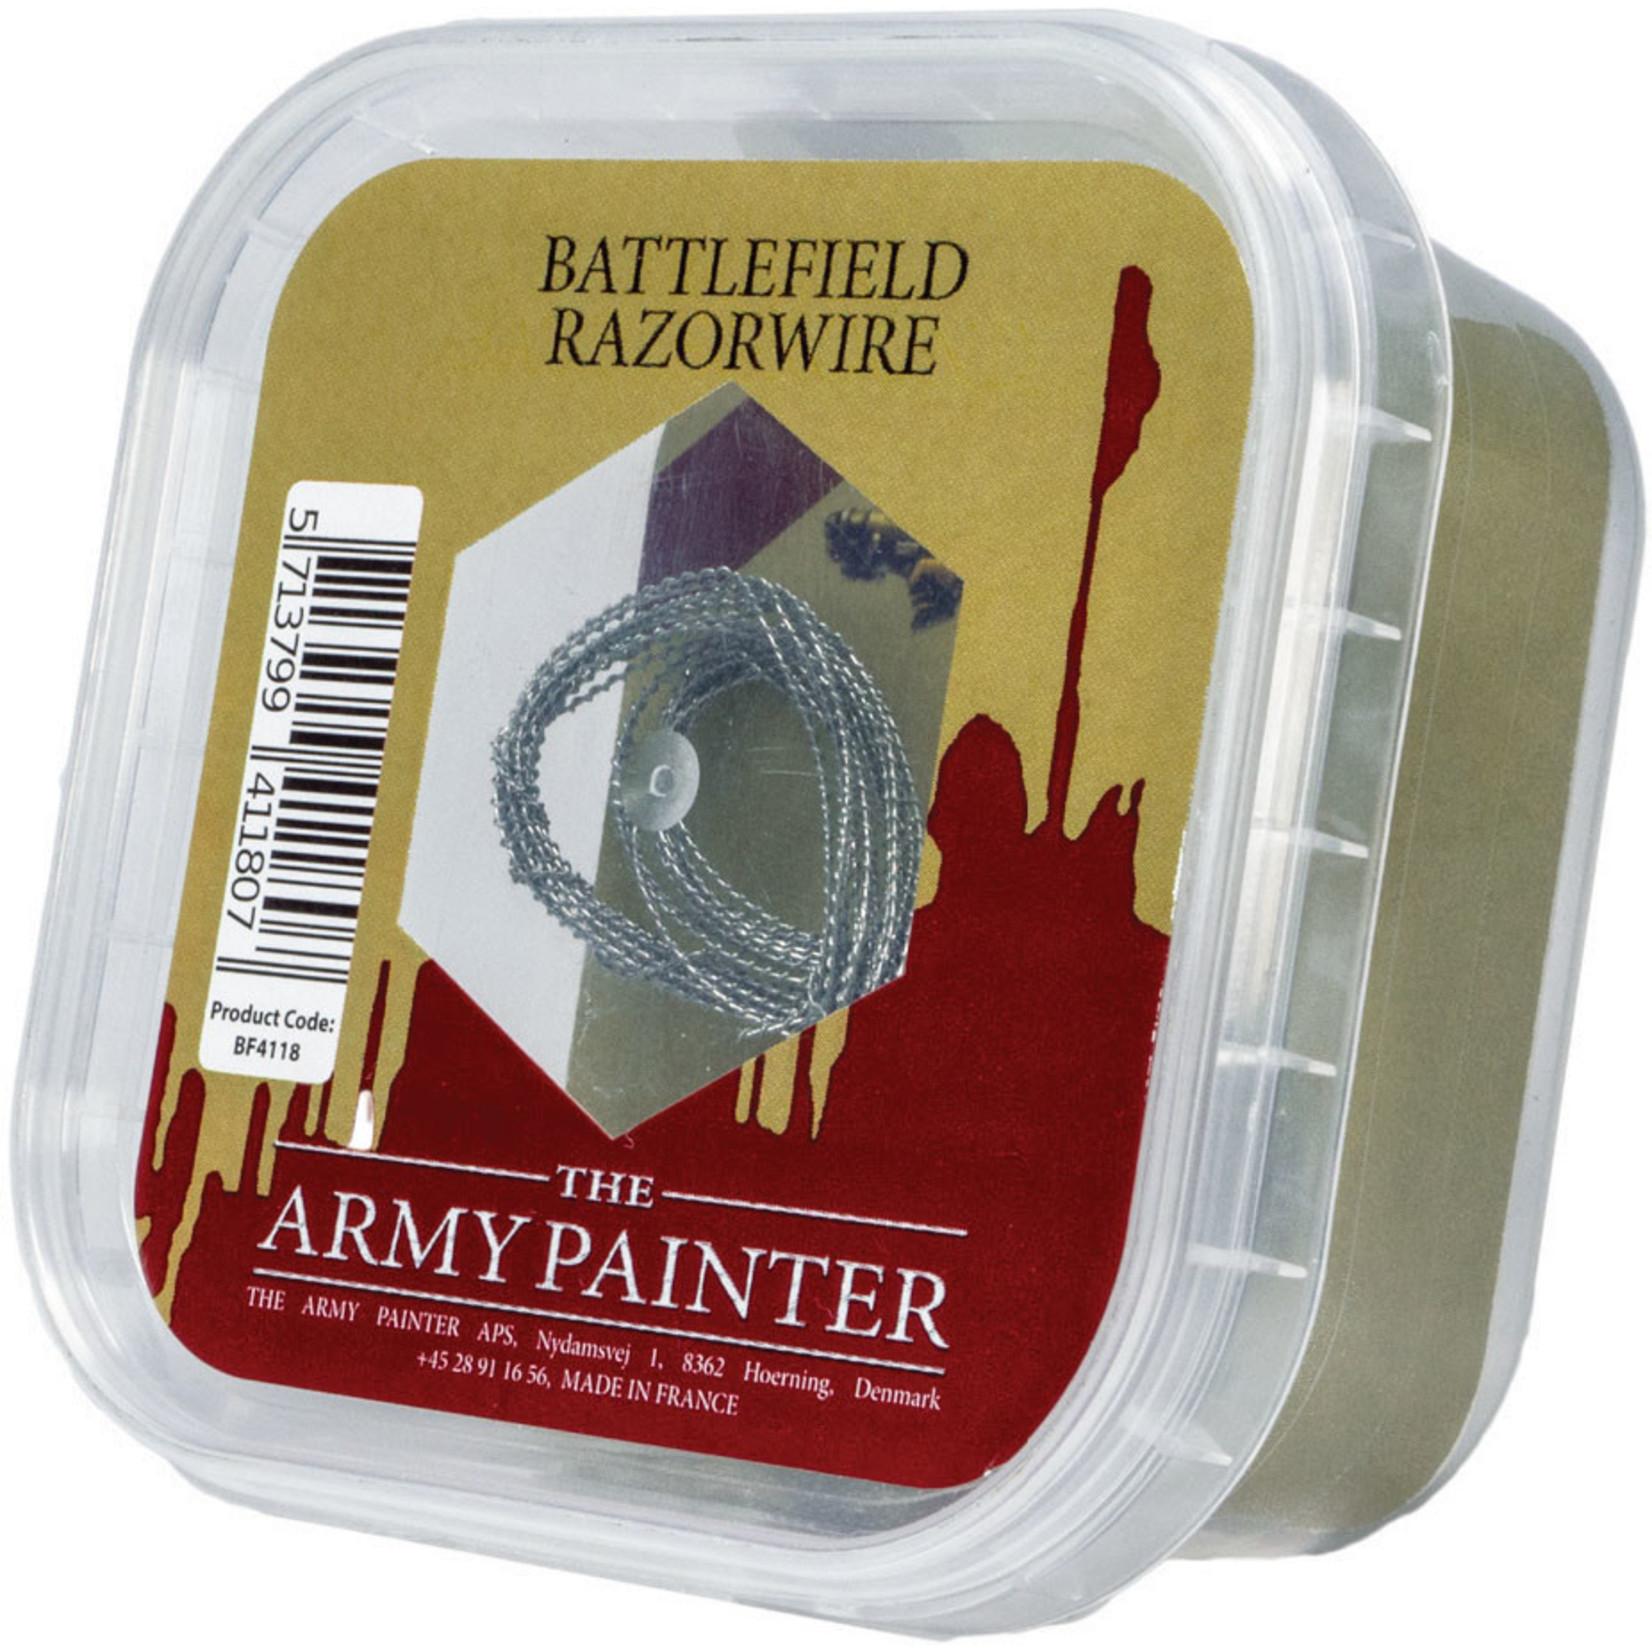 Army Painter Battlefields: Battlefield Razorwire